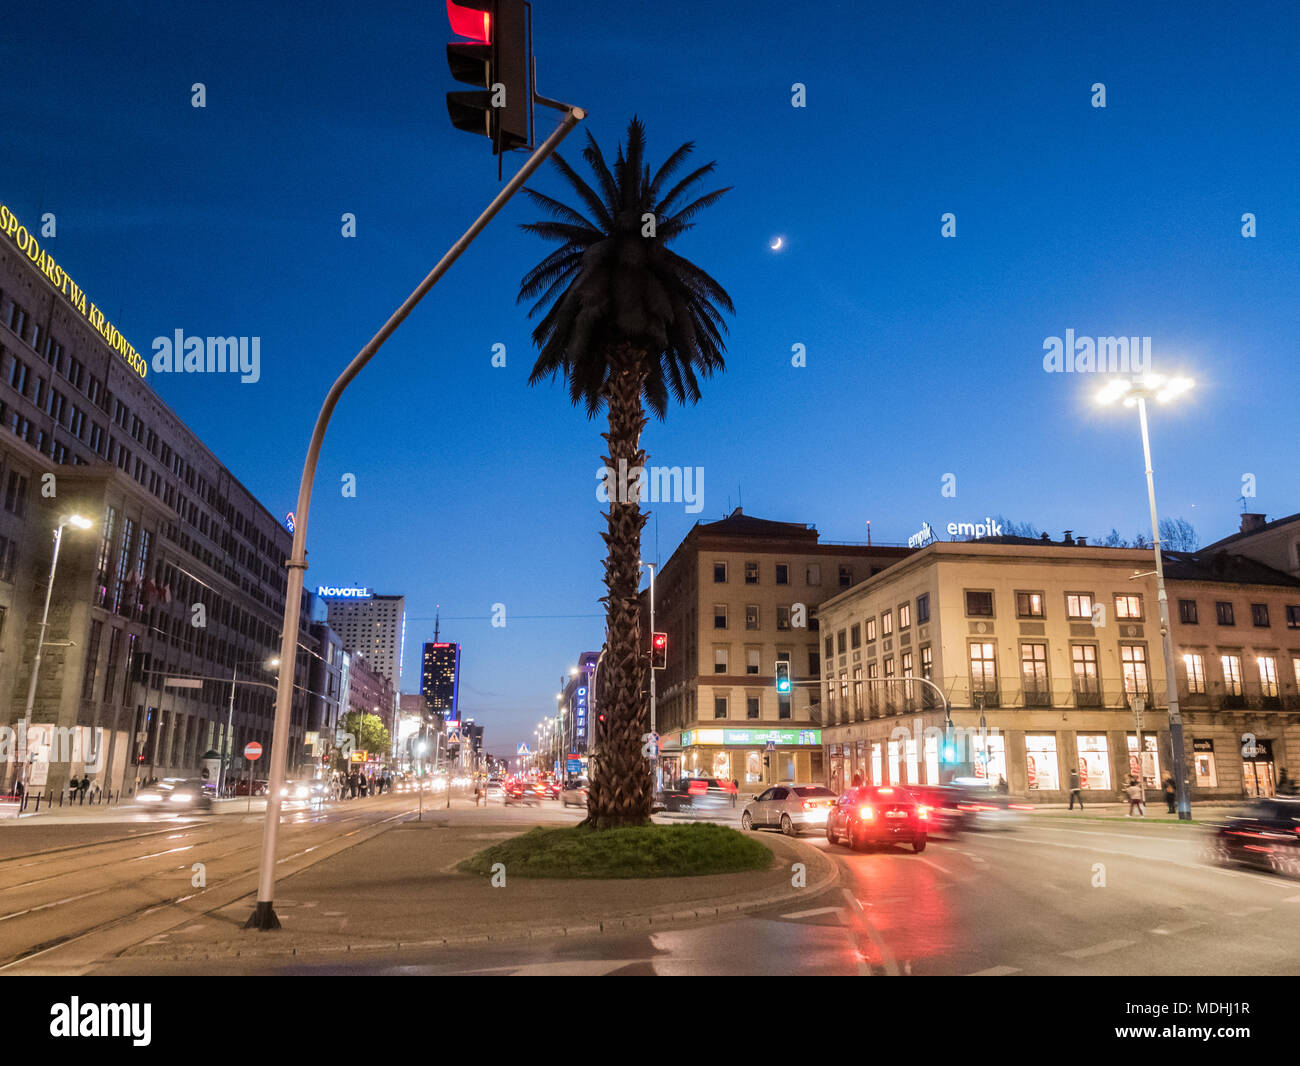 The Palm, Plac de Gaulle'a (de Gaulle Roundabout) and Aleje Jerozolimskie (Jerusalem Avenue) at night, Warsaw, Polsnd - Stock Image